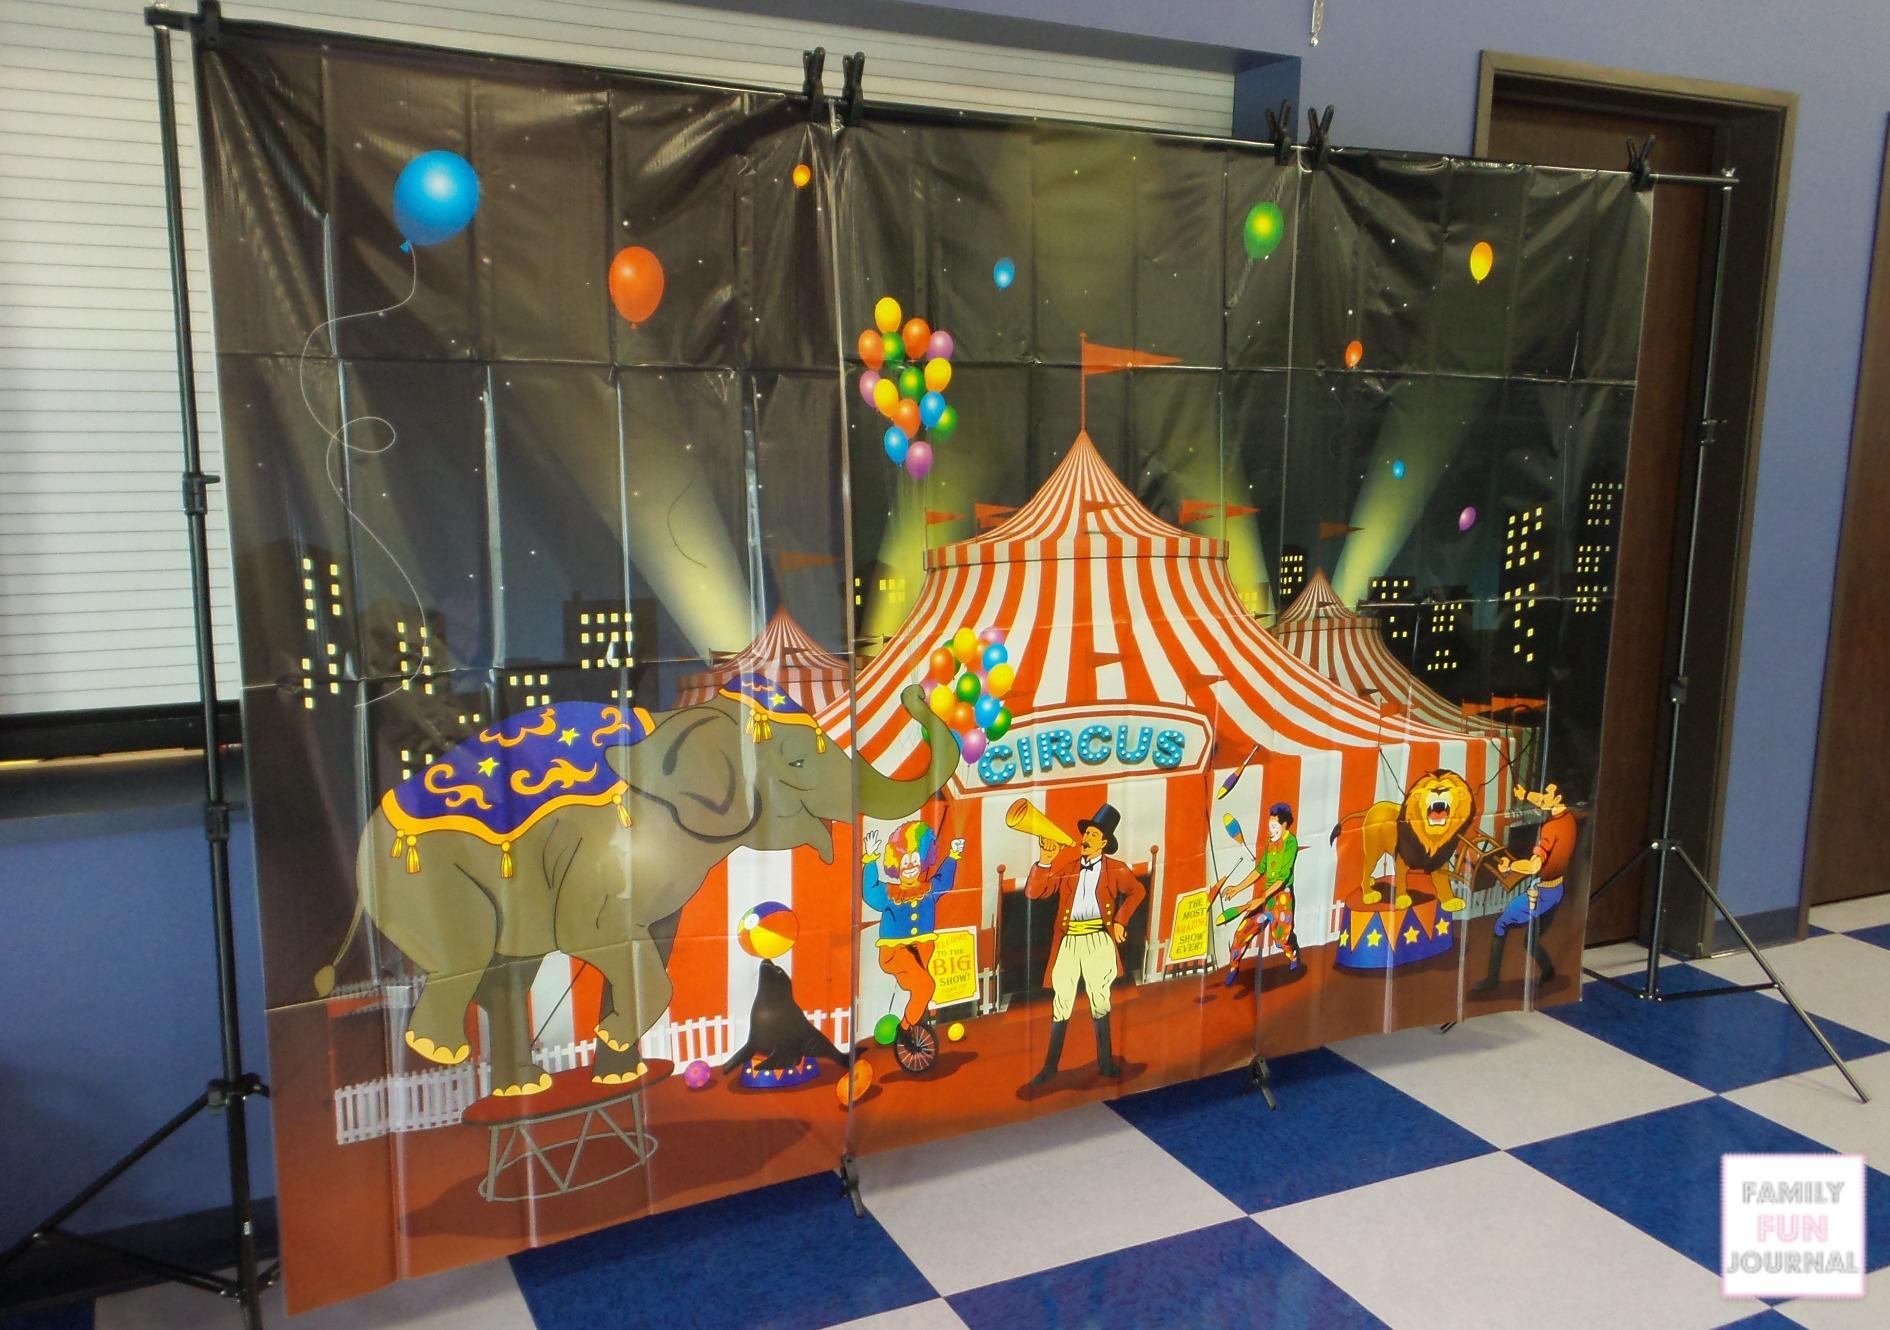 Circus Birthday Party Supplies Family Fun Journal